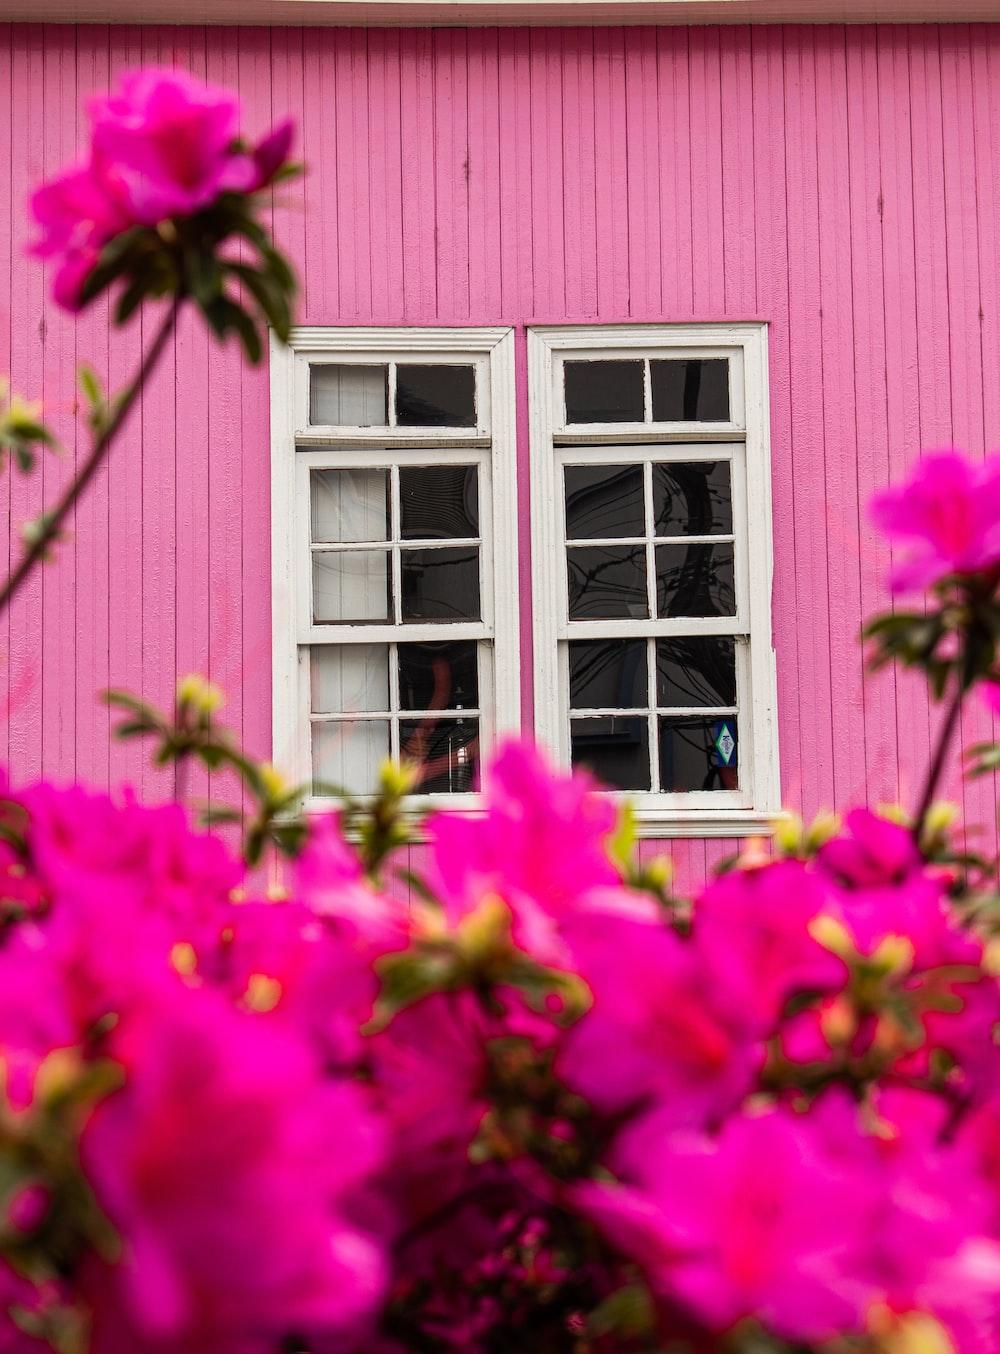 pink-petaled flower closeup photography